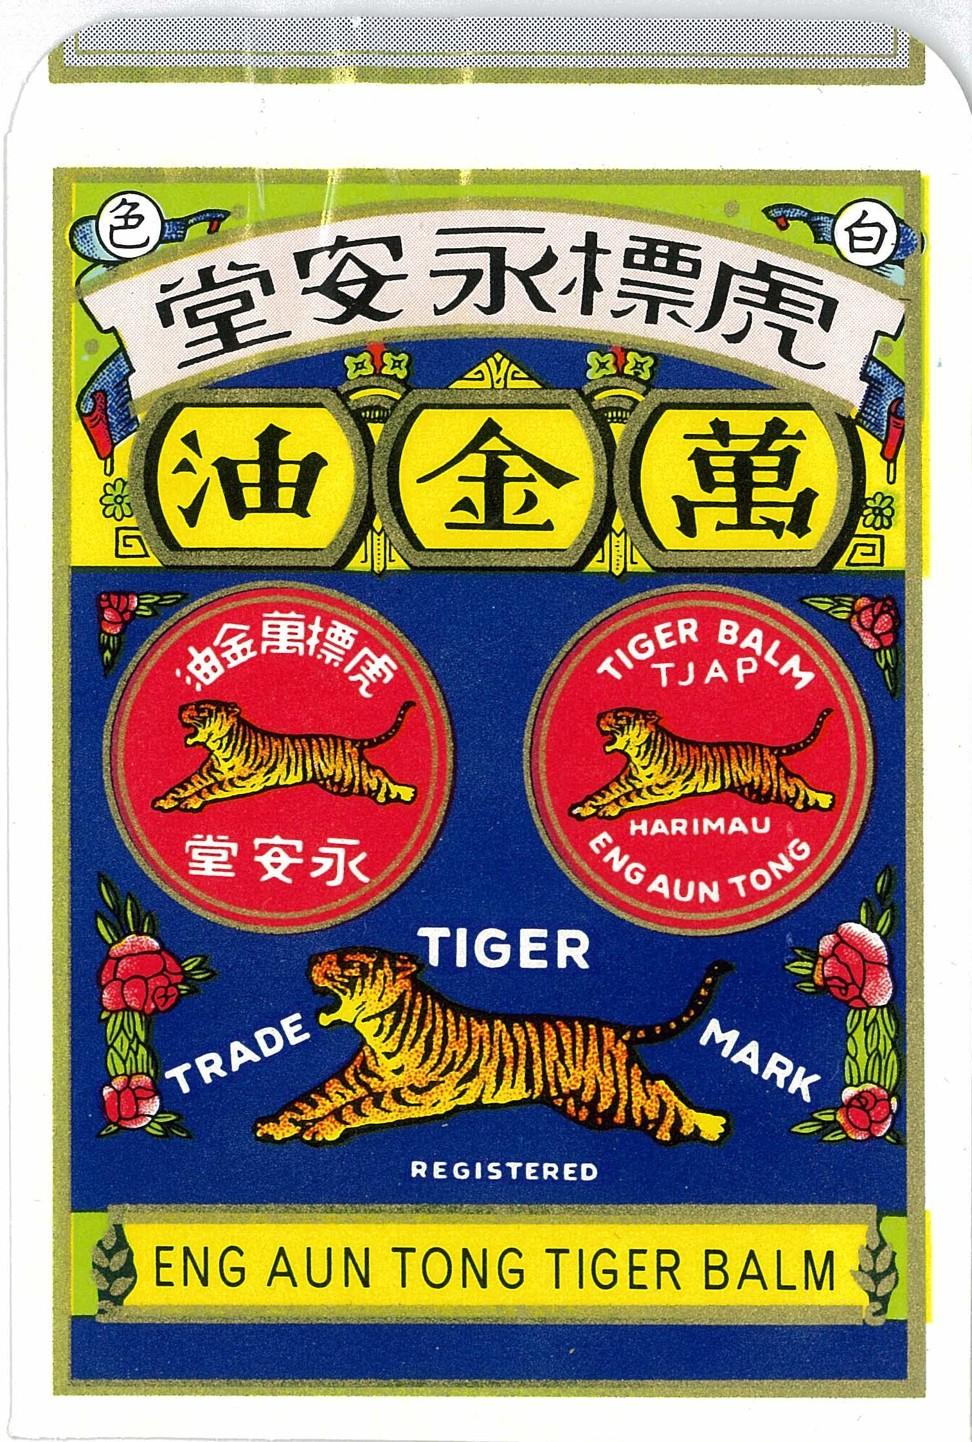 The classic Tiger Balm tins. Photo: Haw Par Corporation